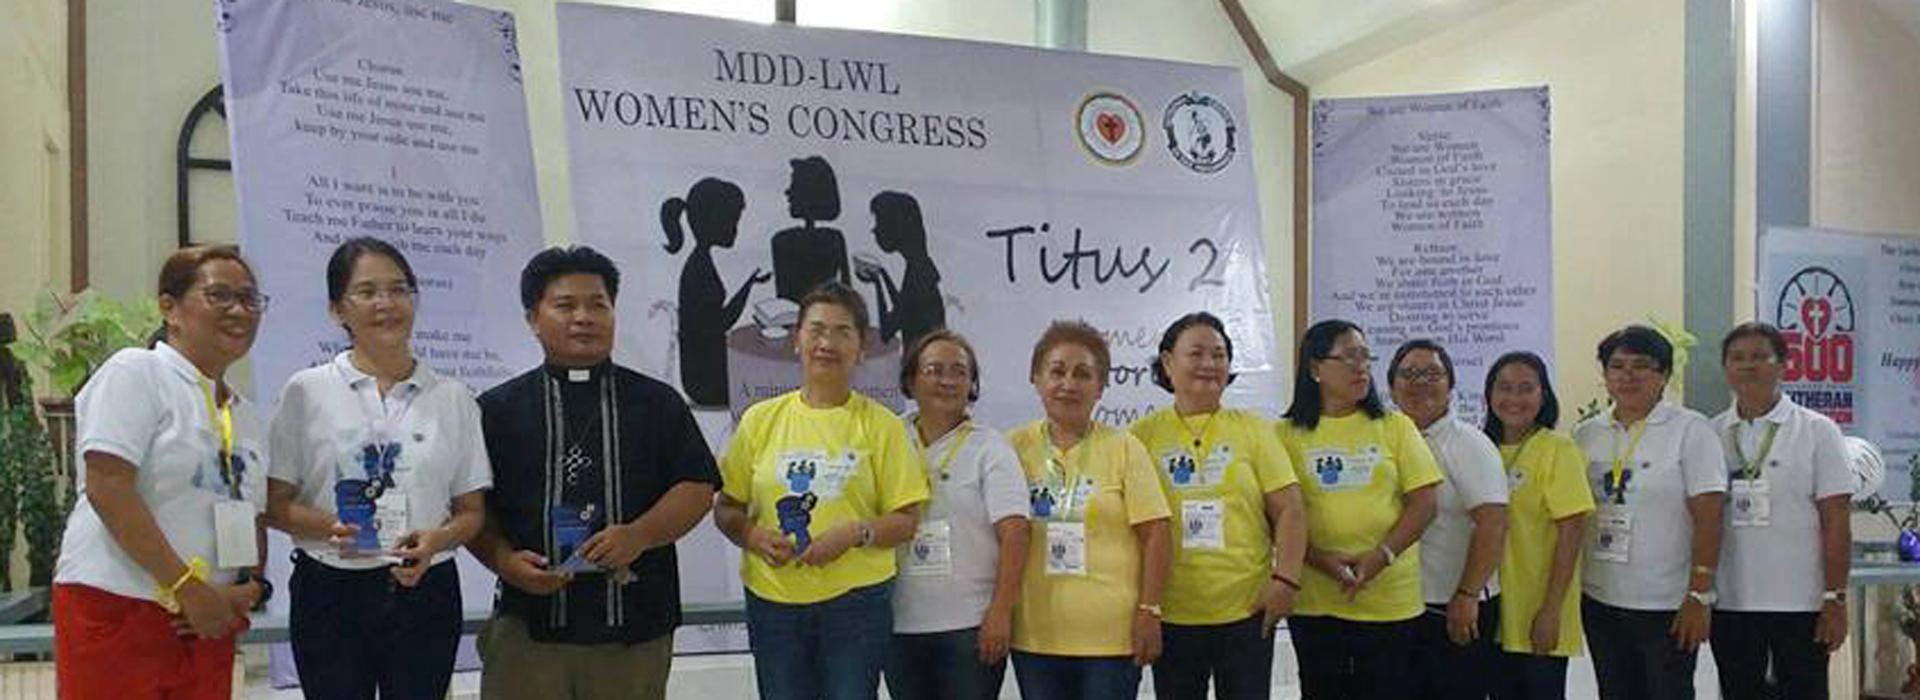 Revitalizing the Women's: MDD-LWL Women's Congress